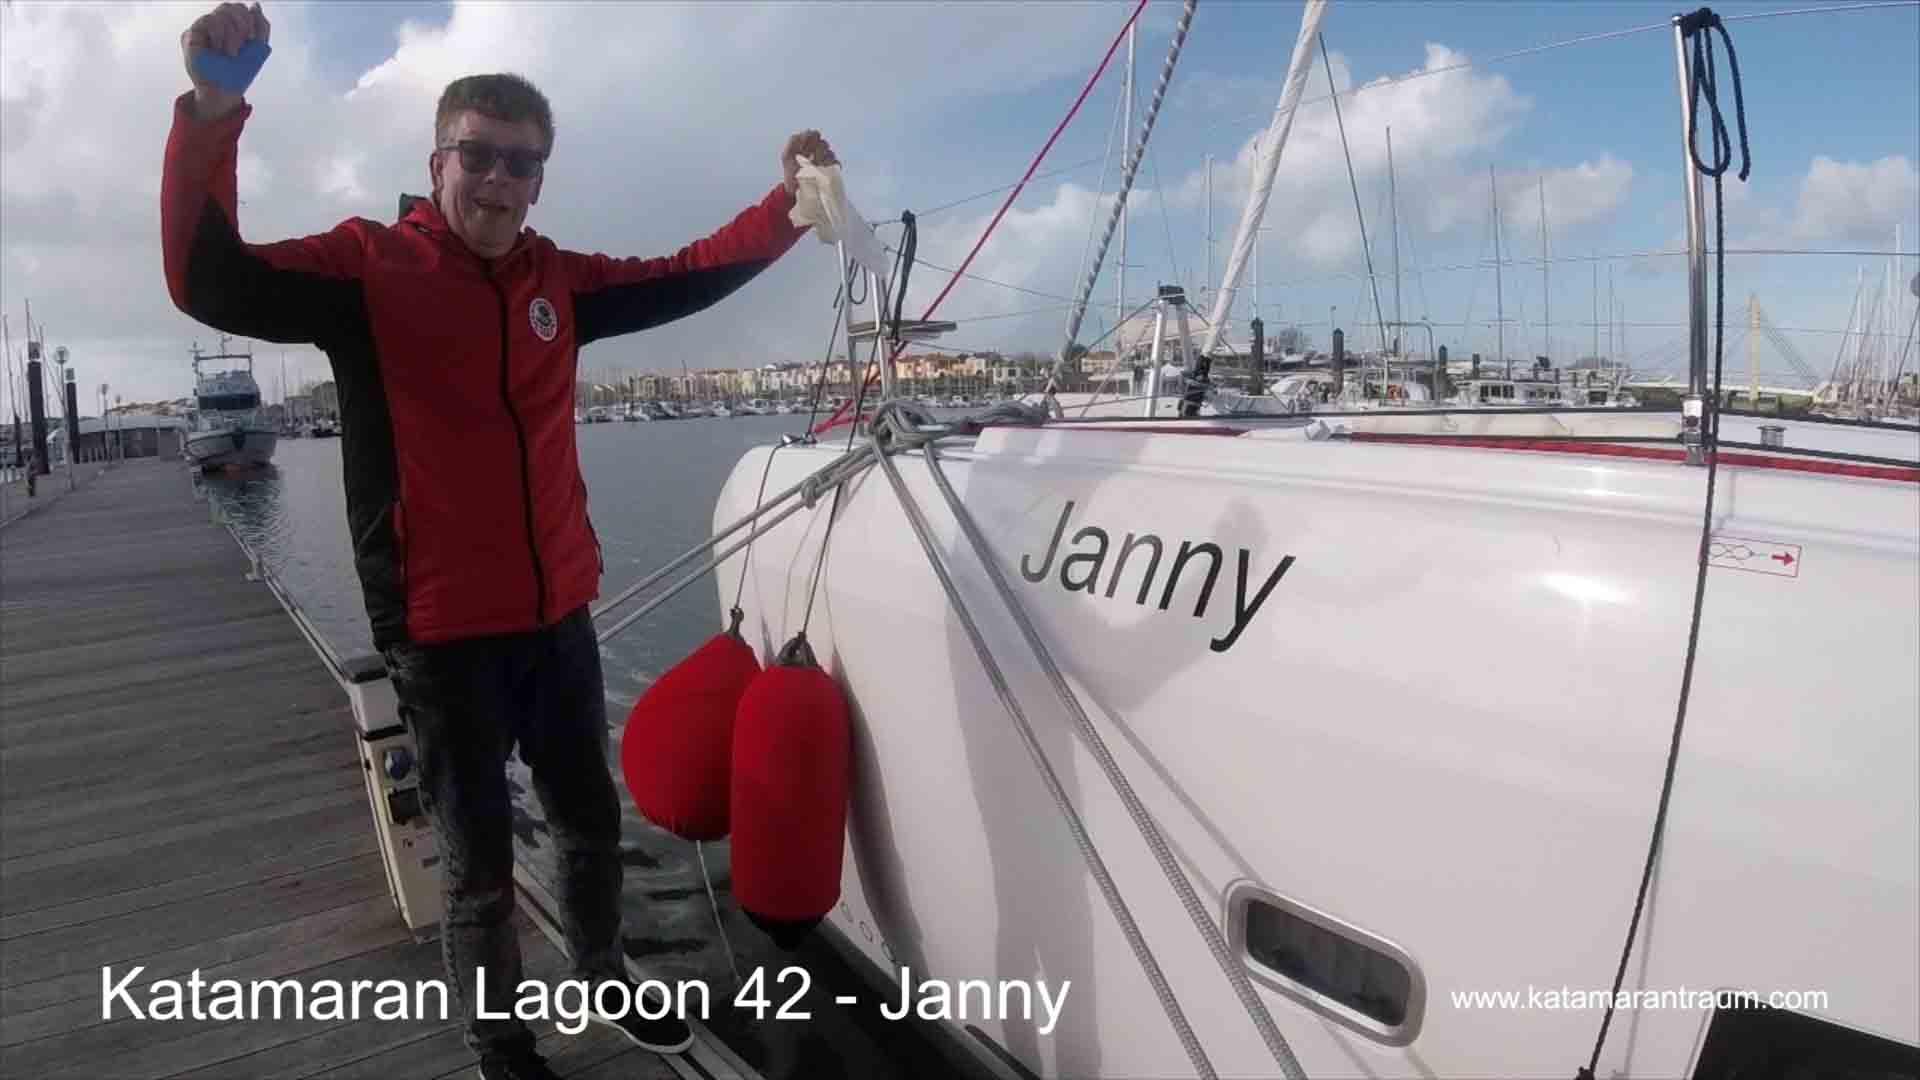 Katamaran Lagoon 42 Janny bei der Übergabe in Les Sables